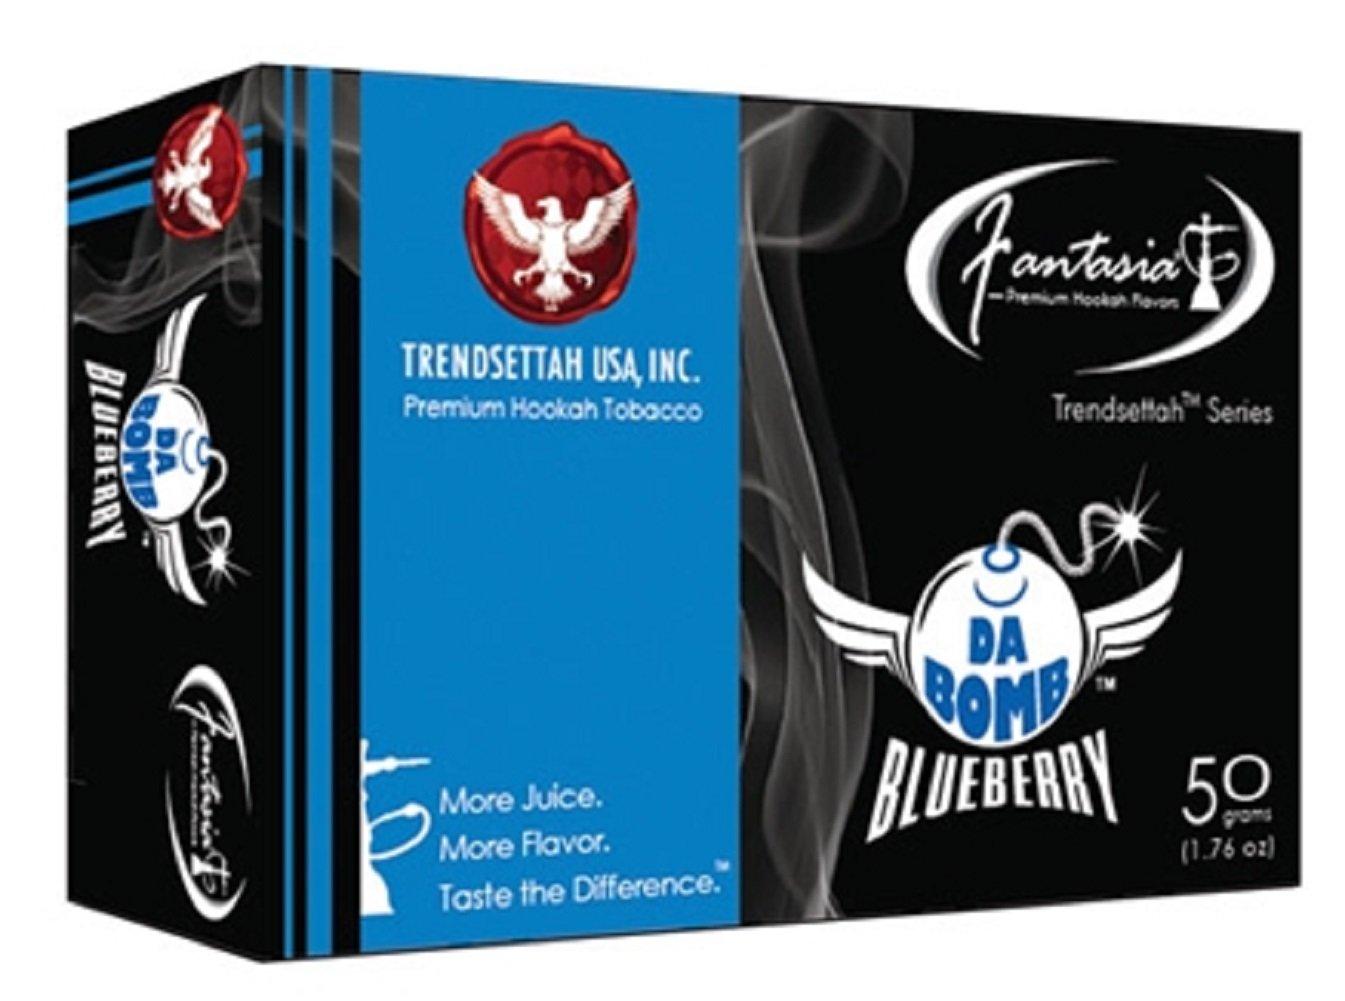 Fantasia Shisha Molasses Premium Flavors 50g For Hookah (Da Bomb Blueberry) by Standpoint